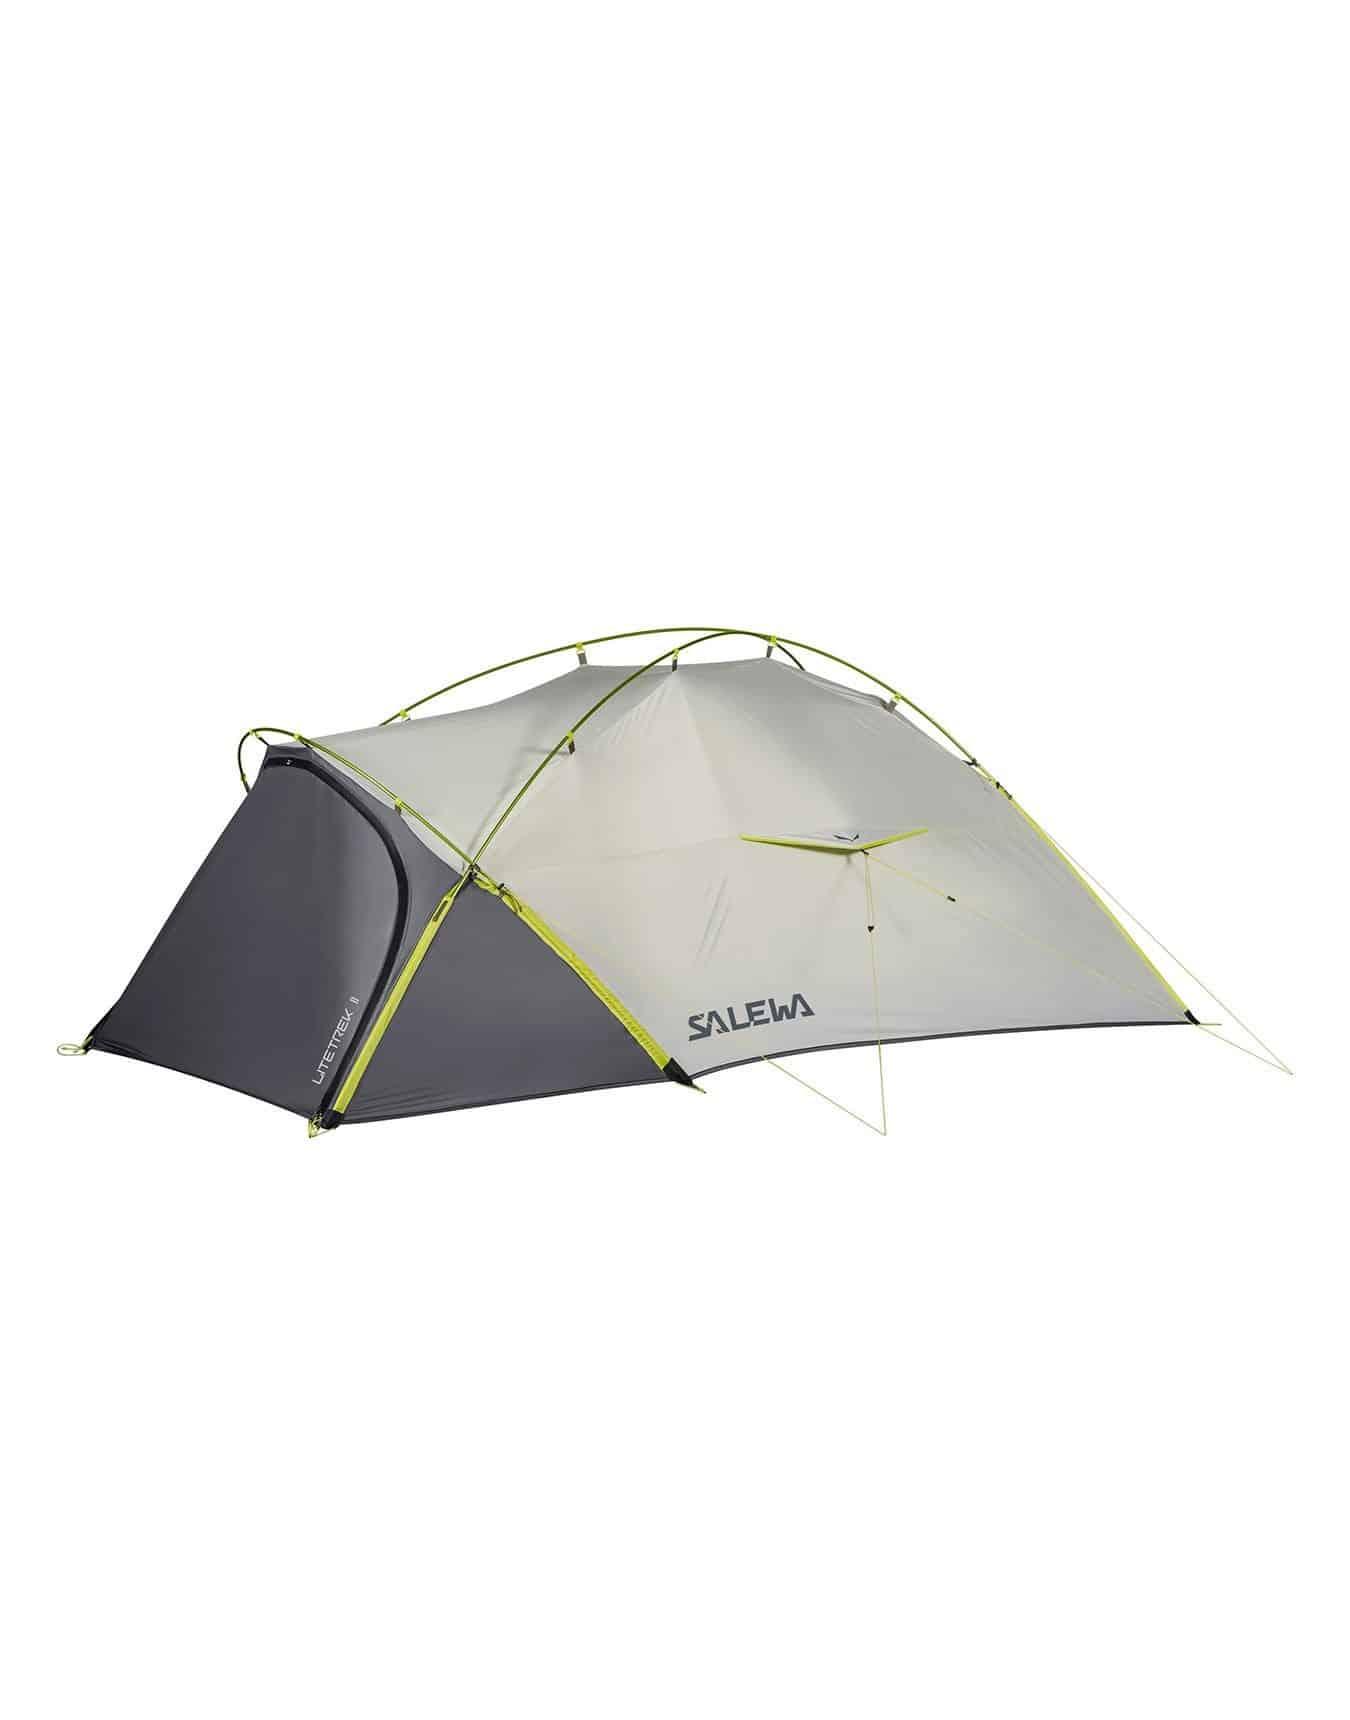 Une tente waterproof 2 personnes